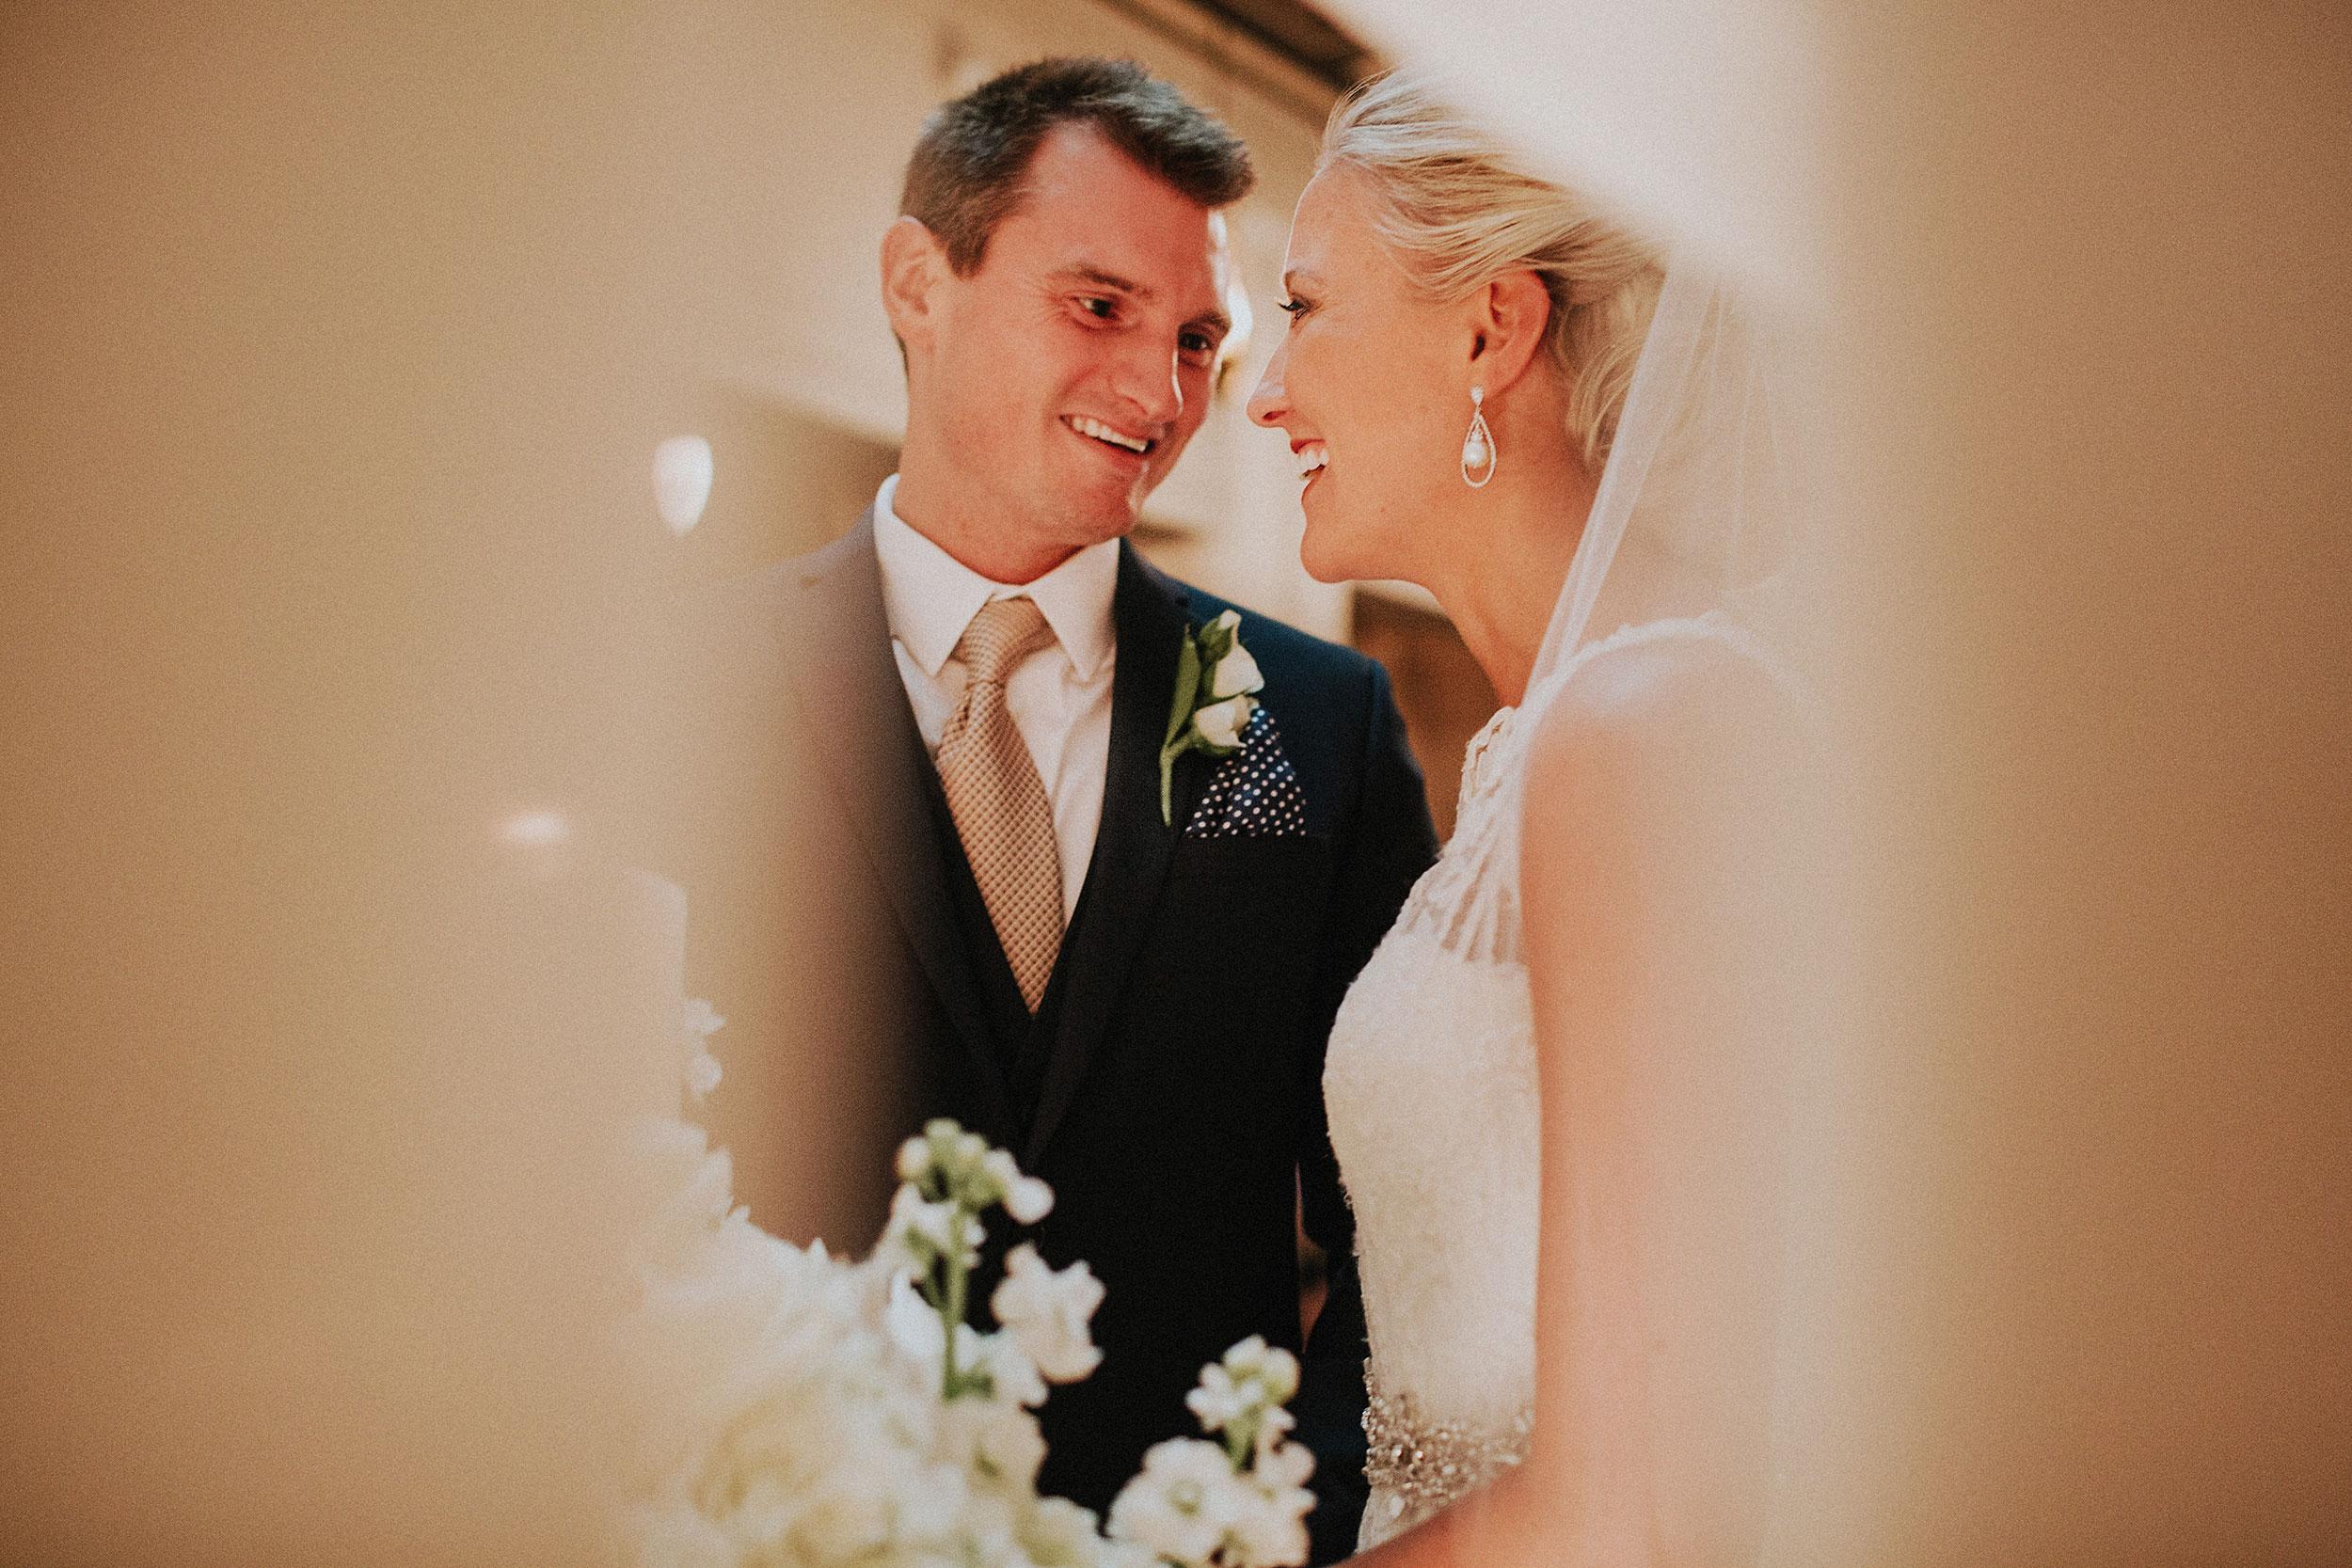 olmsted-wedding-louisville-kentucky-028.JPG